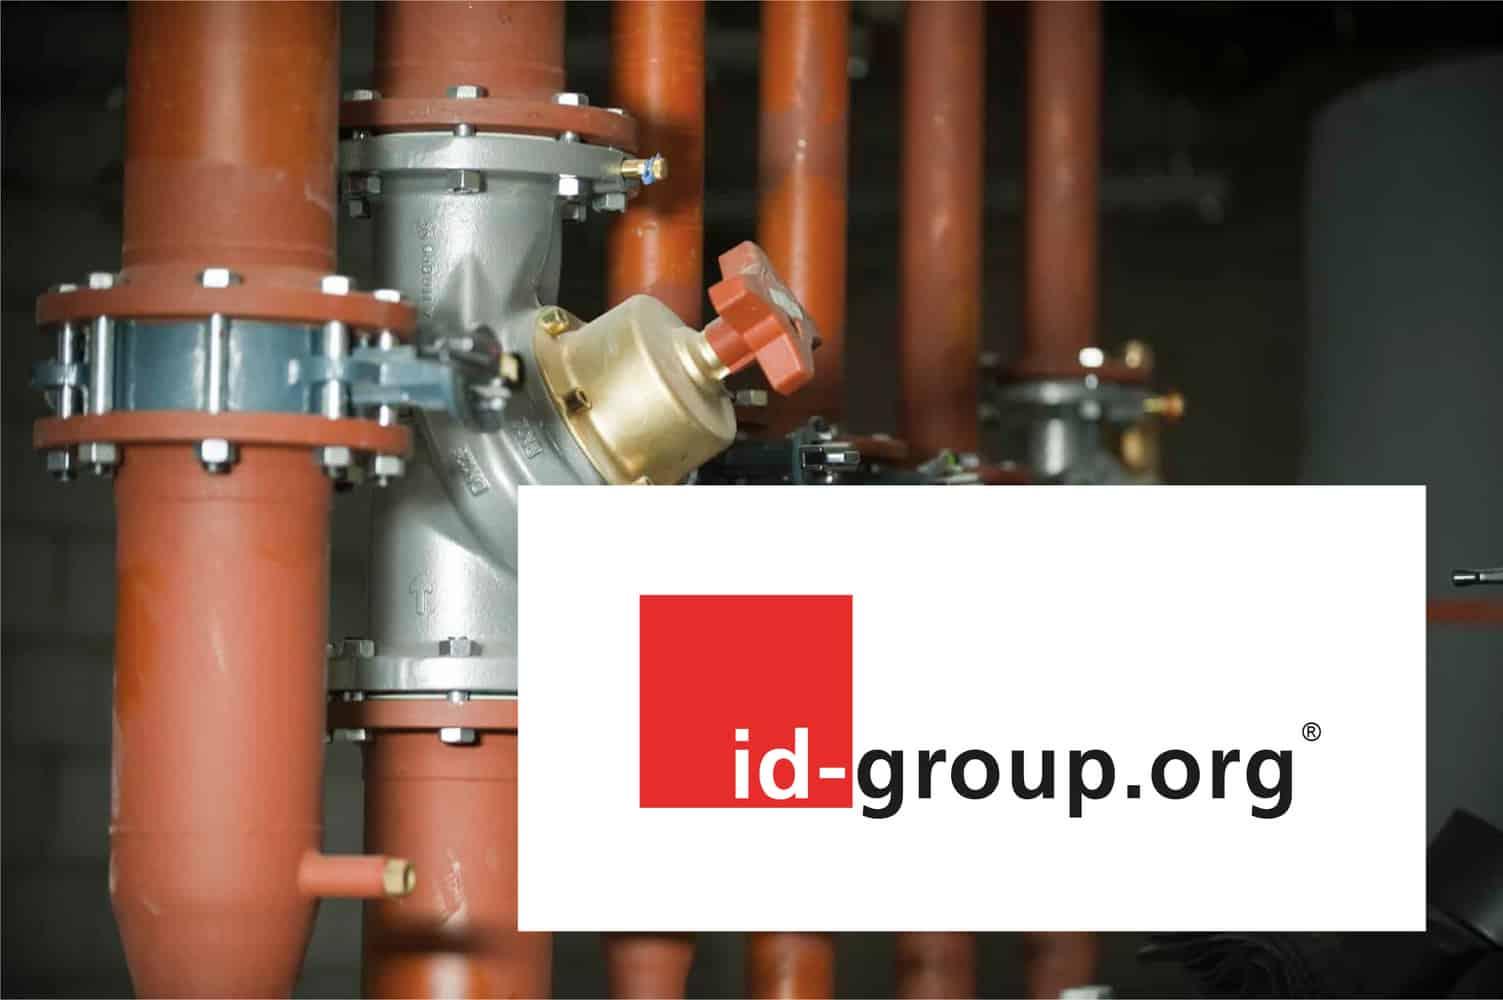 id-group.org – Digital workplace